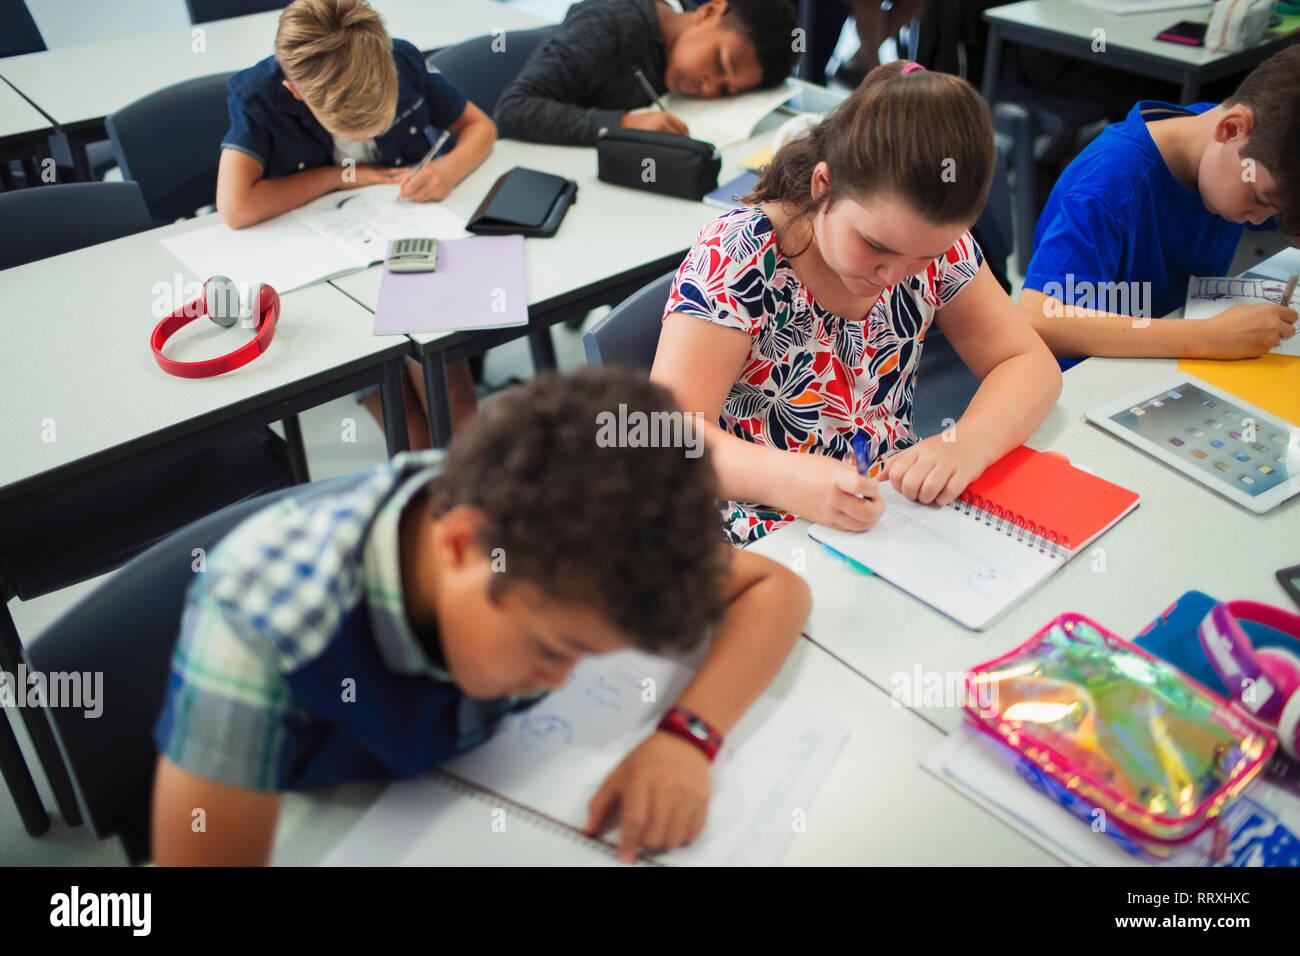 Junior high school students doing homework at desks in classroom Stock Photo